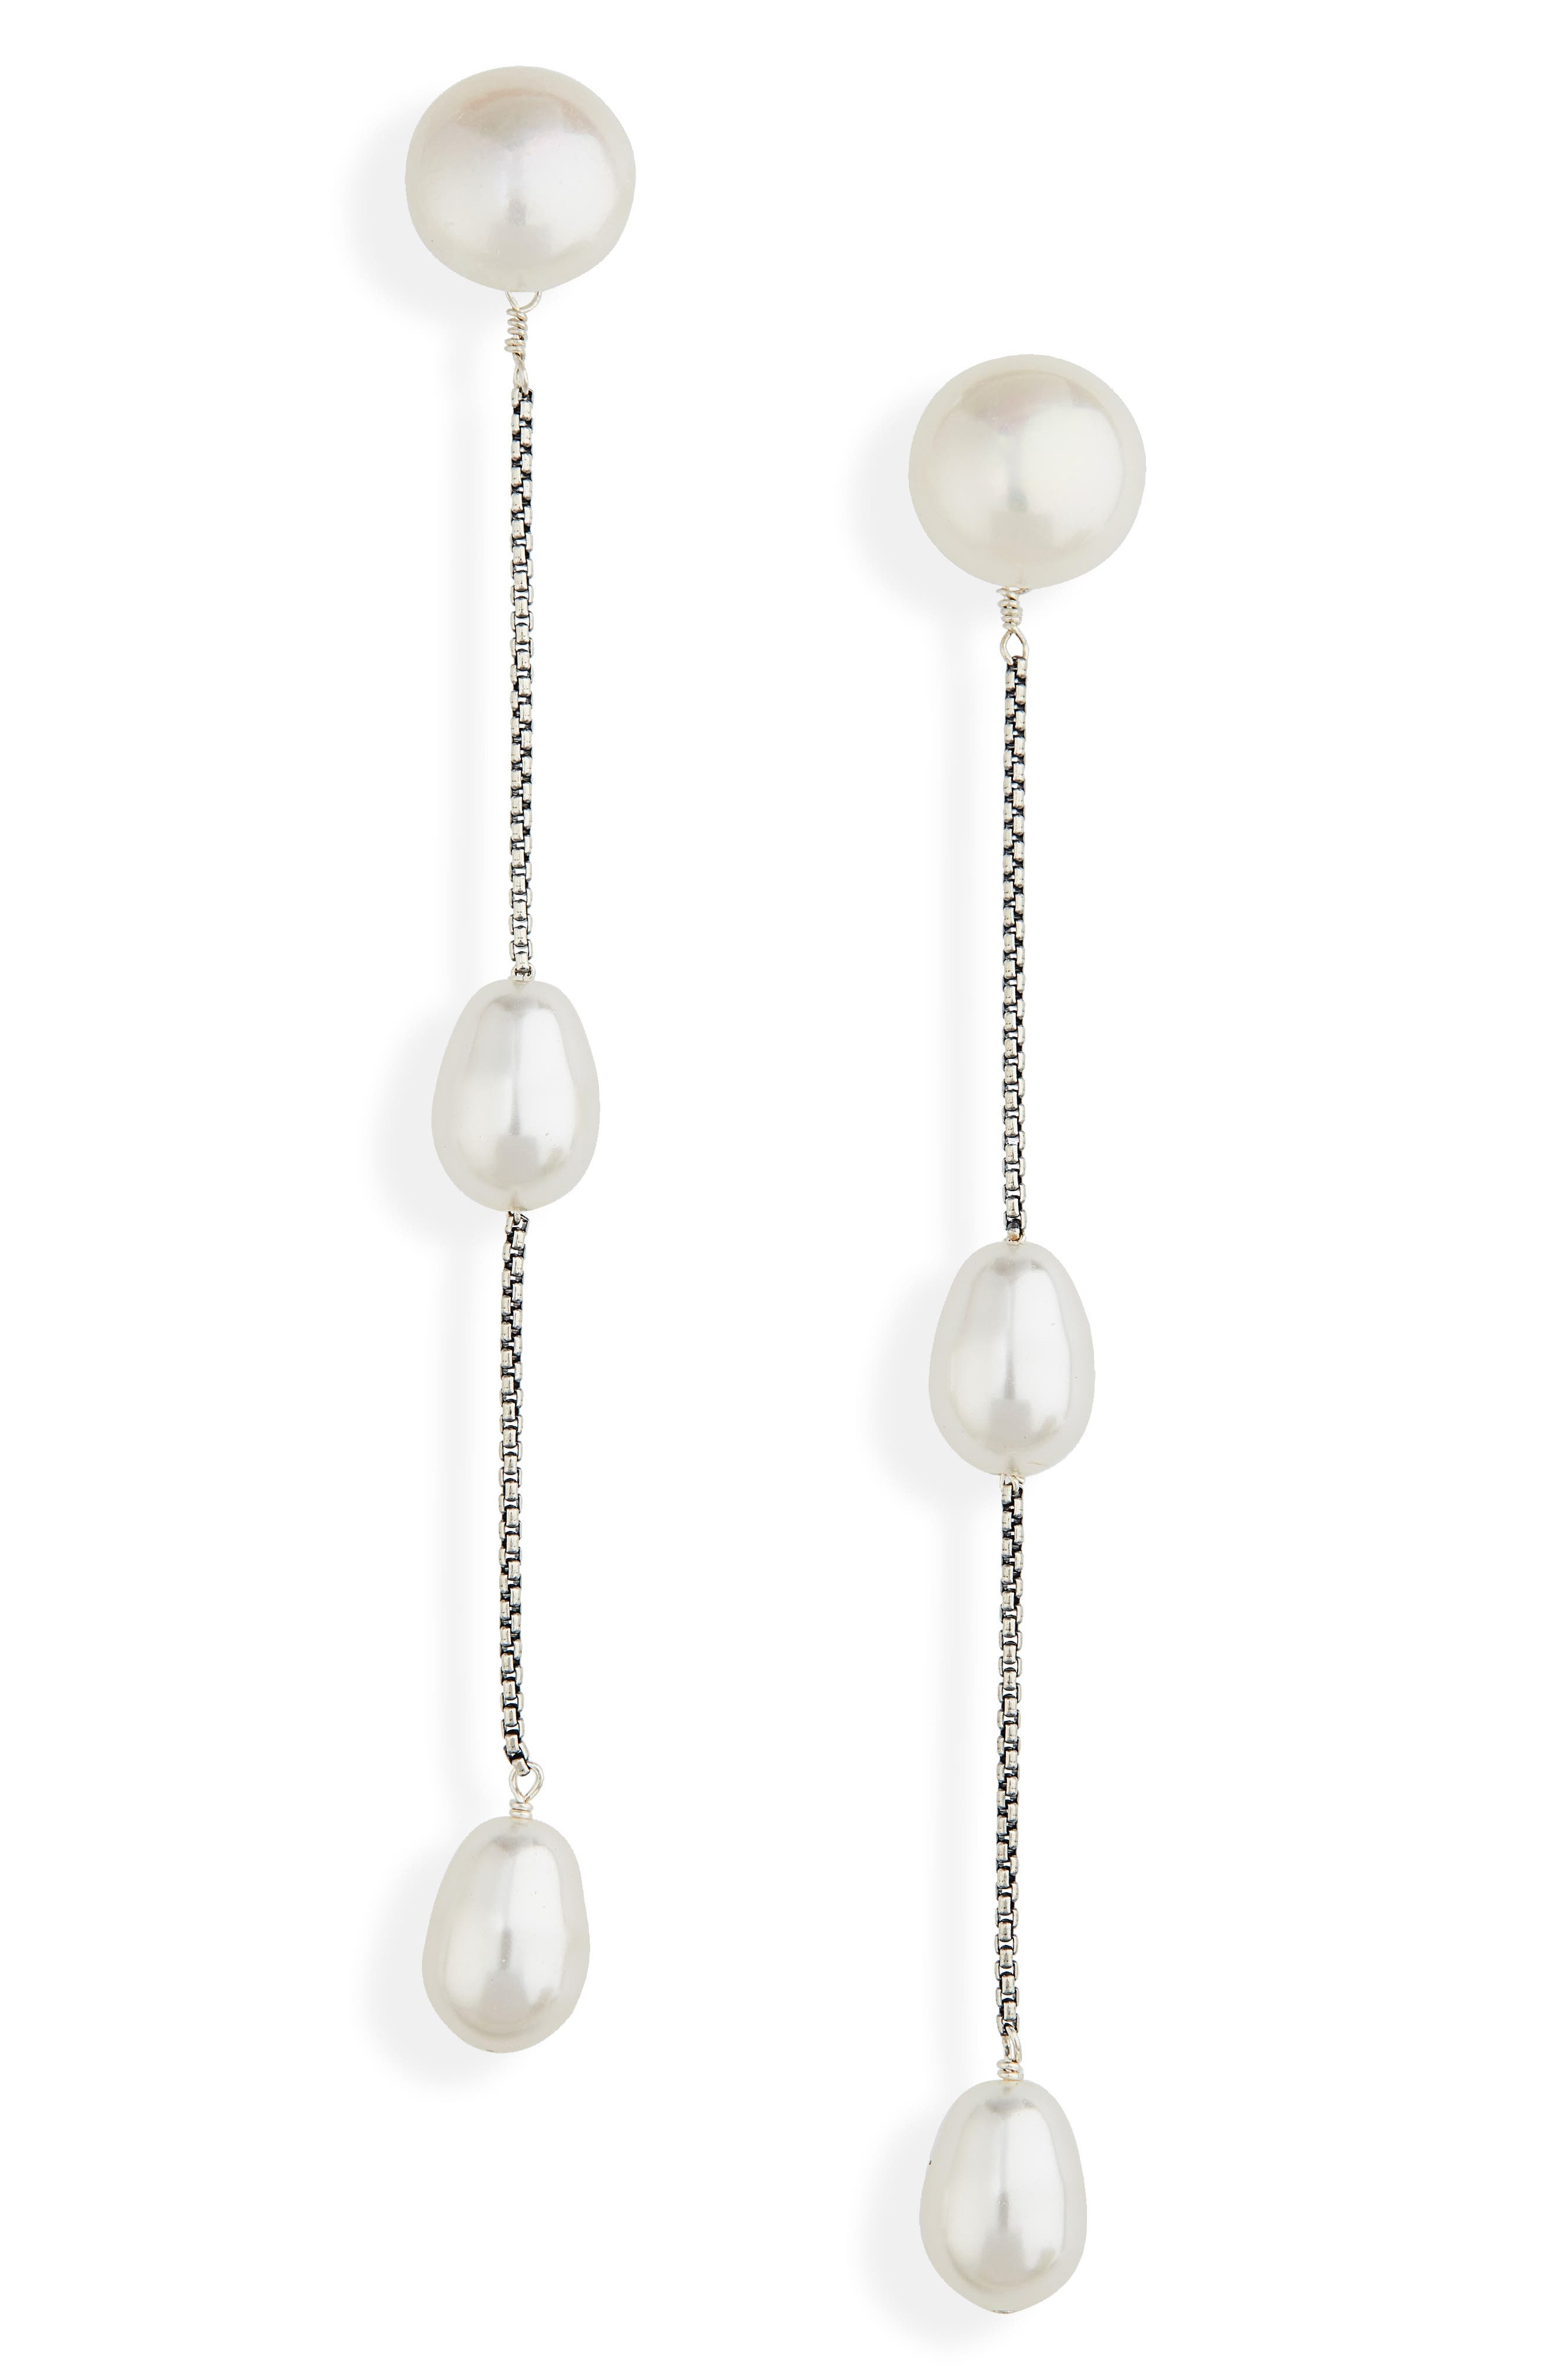 Imitation Pearl Linear Drop Earrings,                             Main thumbnail 1, color,                             STERLING SILVER/ FAUX PEARL